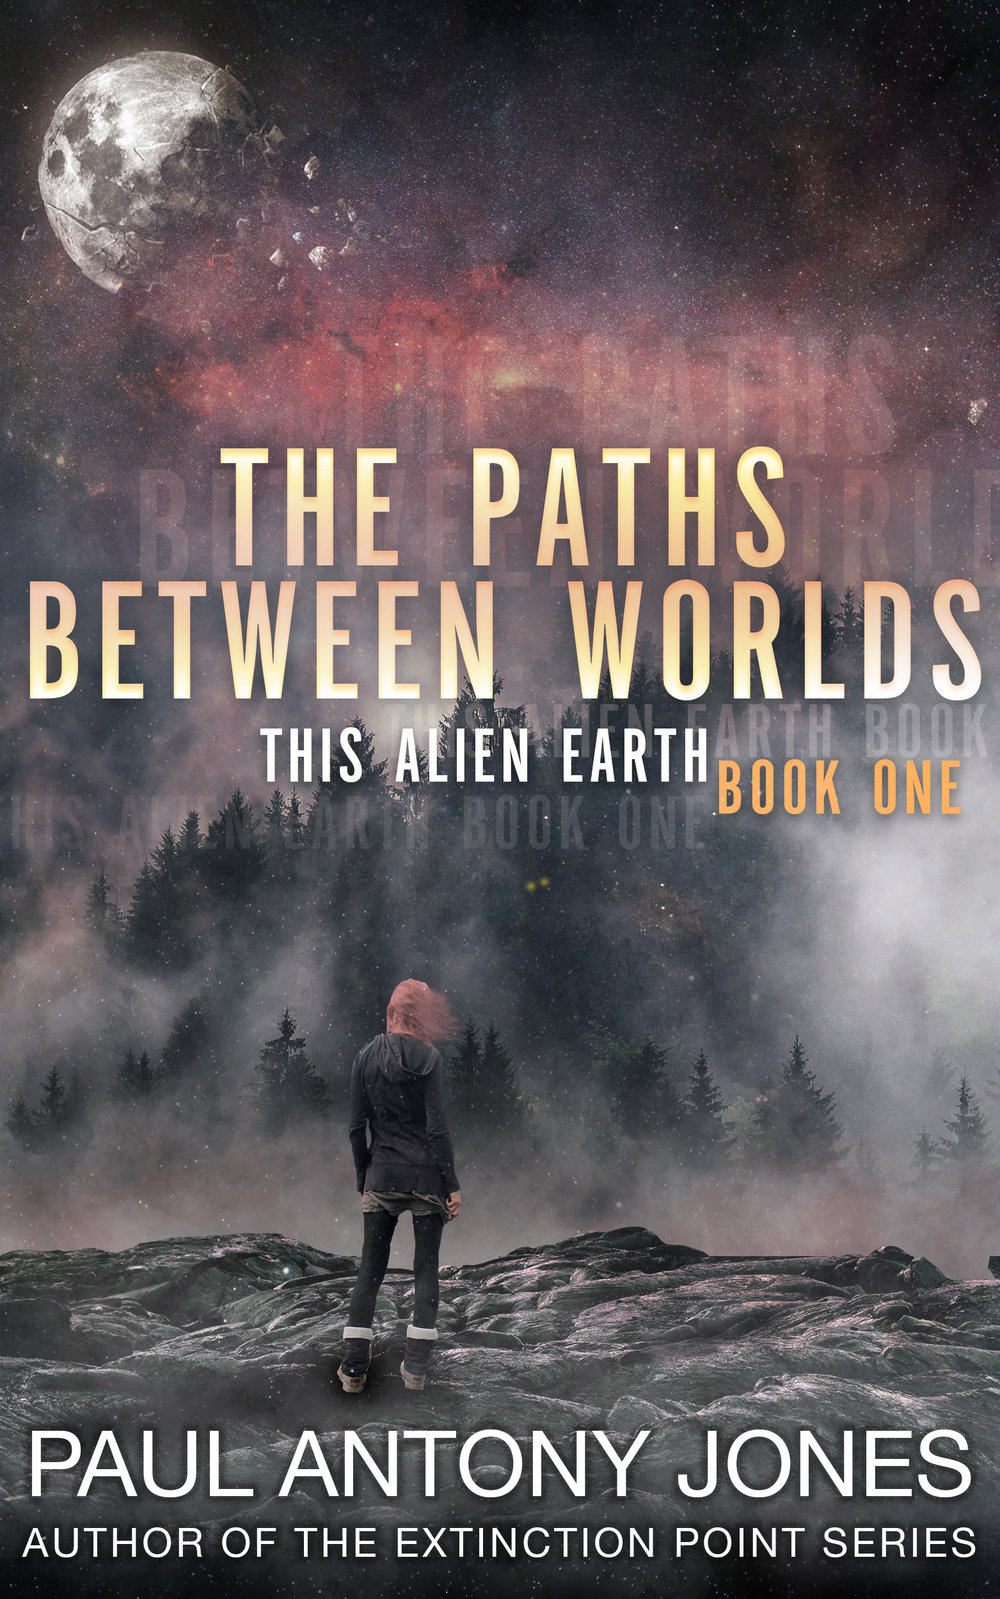 The Paths Between Worlds   This Alien Earth Book 1  Paul Antony Jones